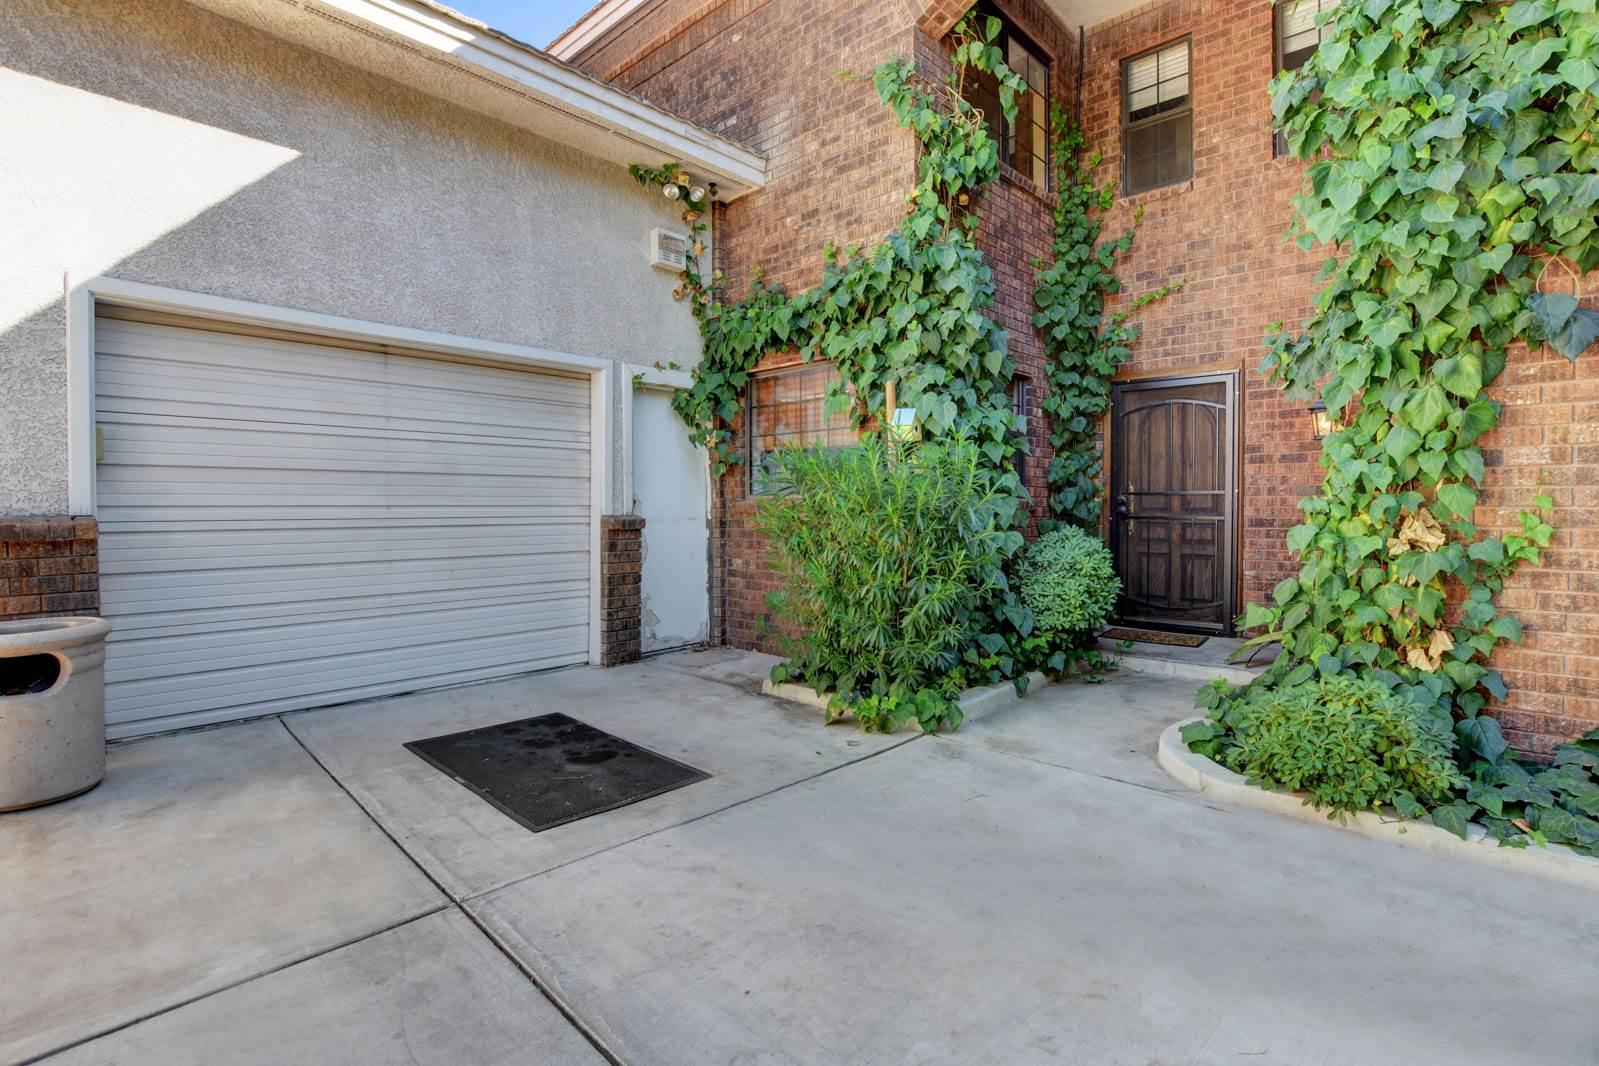 10 Hummingbird Lane, Henderson, NV 89014